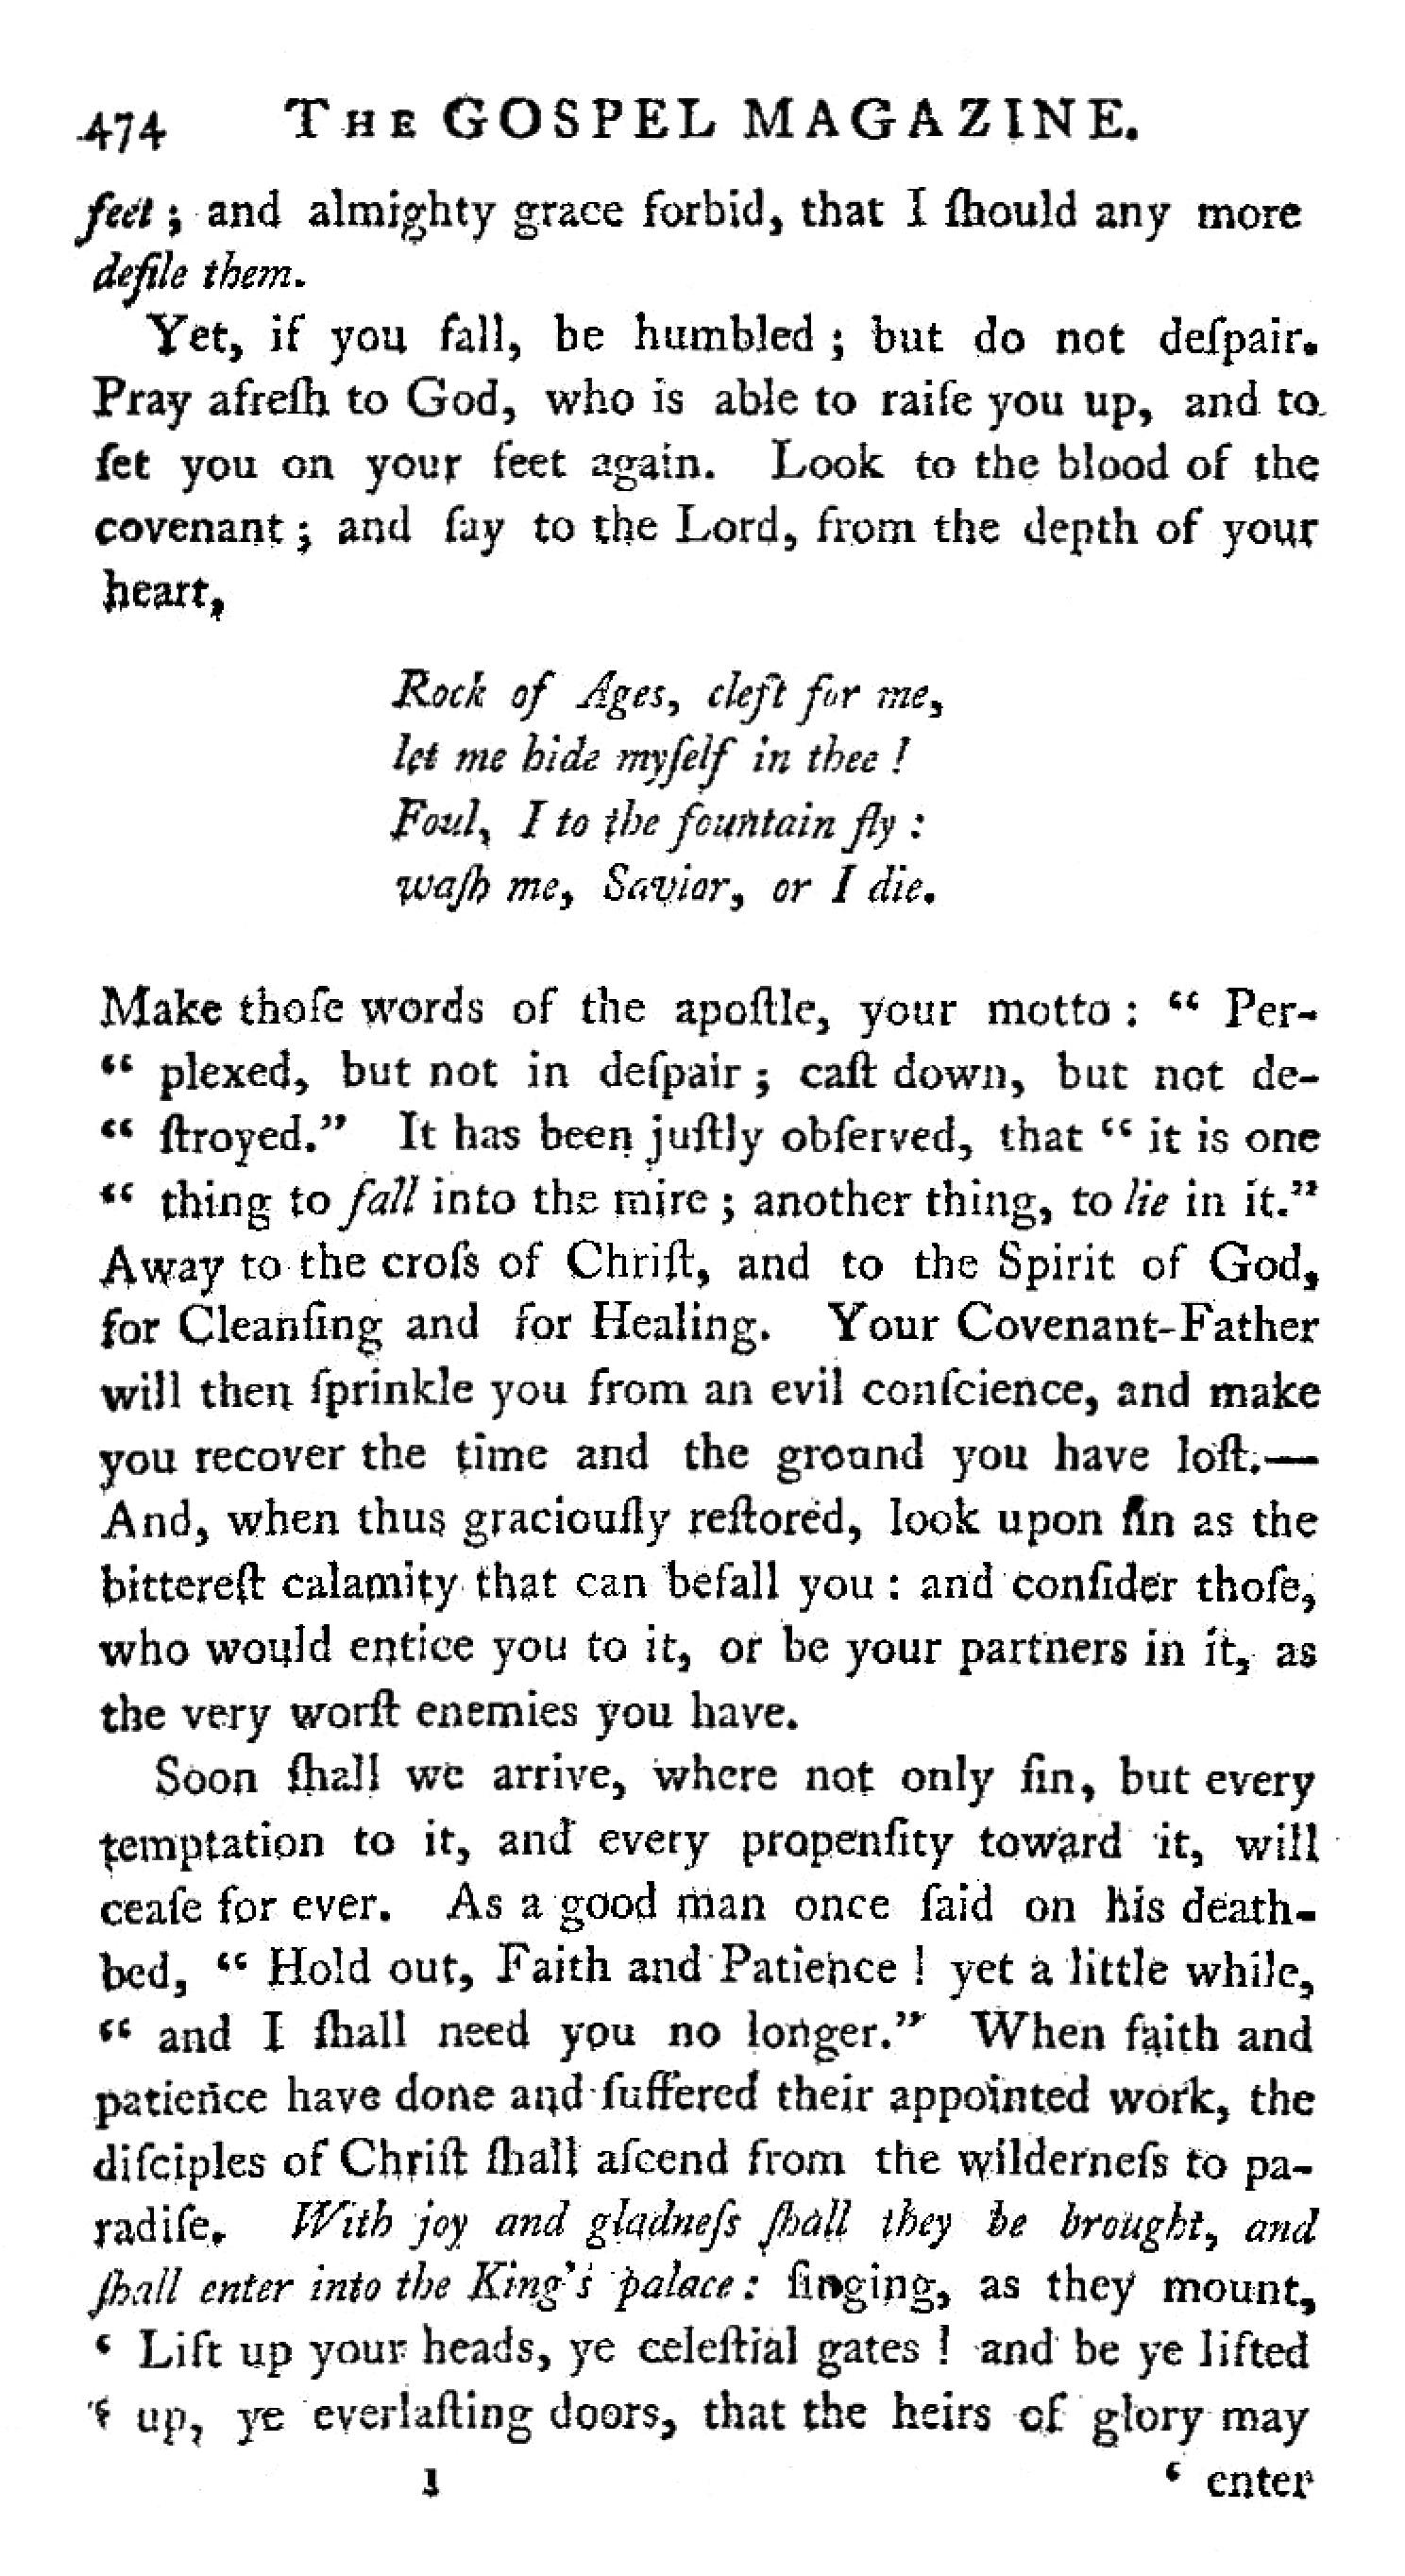 Fig. 1.   The Gospel Magazine  (October 1775).